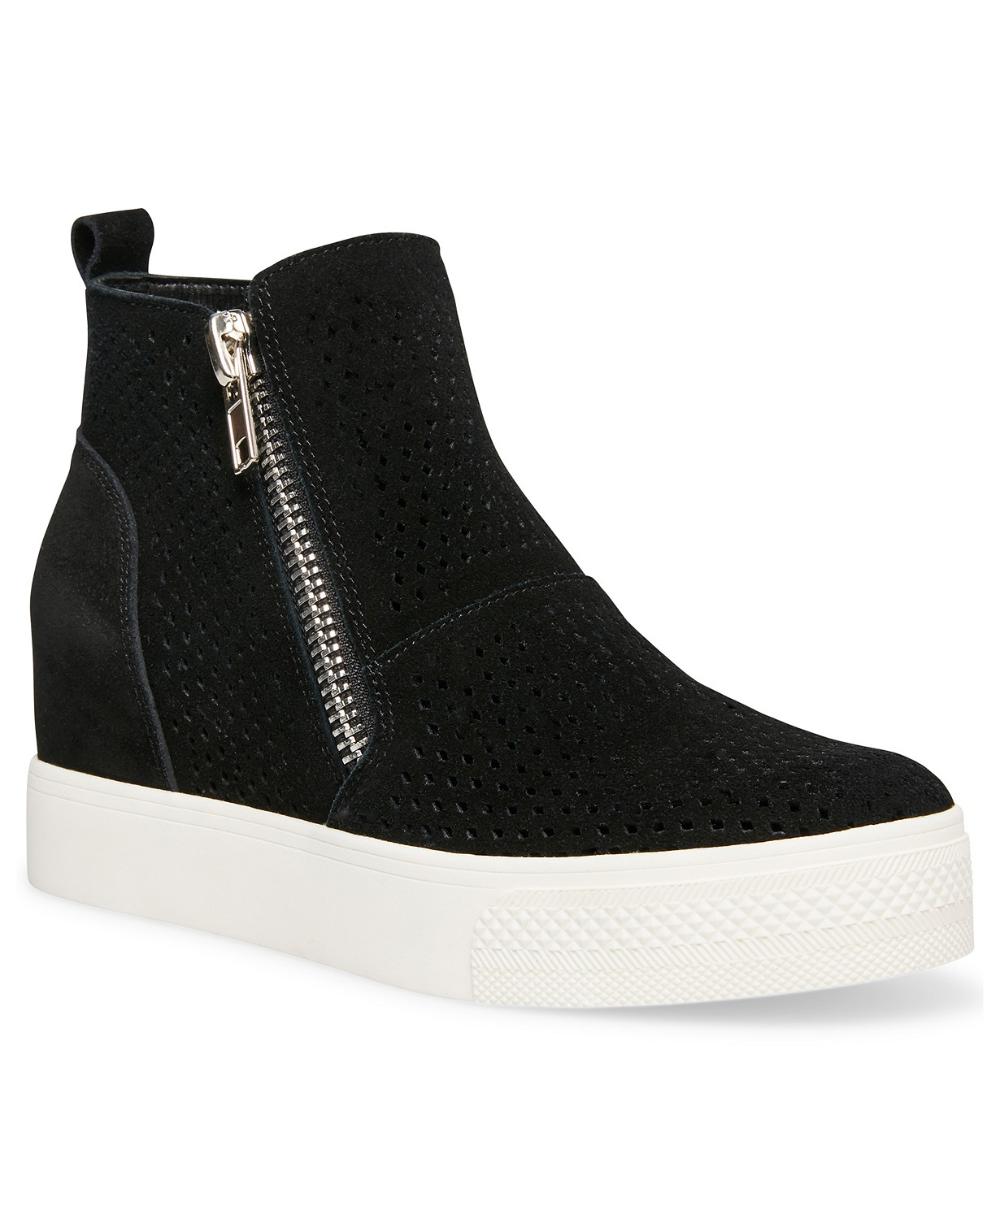 Steve Madden Women S Wedgie Wedge Sneakers Reviews Athletic Shoes Sneakers Shoes Macy S Work Shoes Women Black Wedge Sneakers Trending Shoes